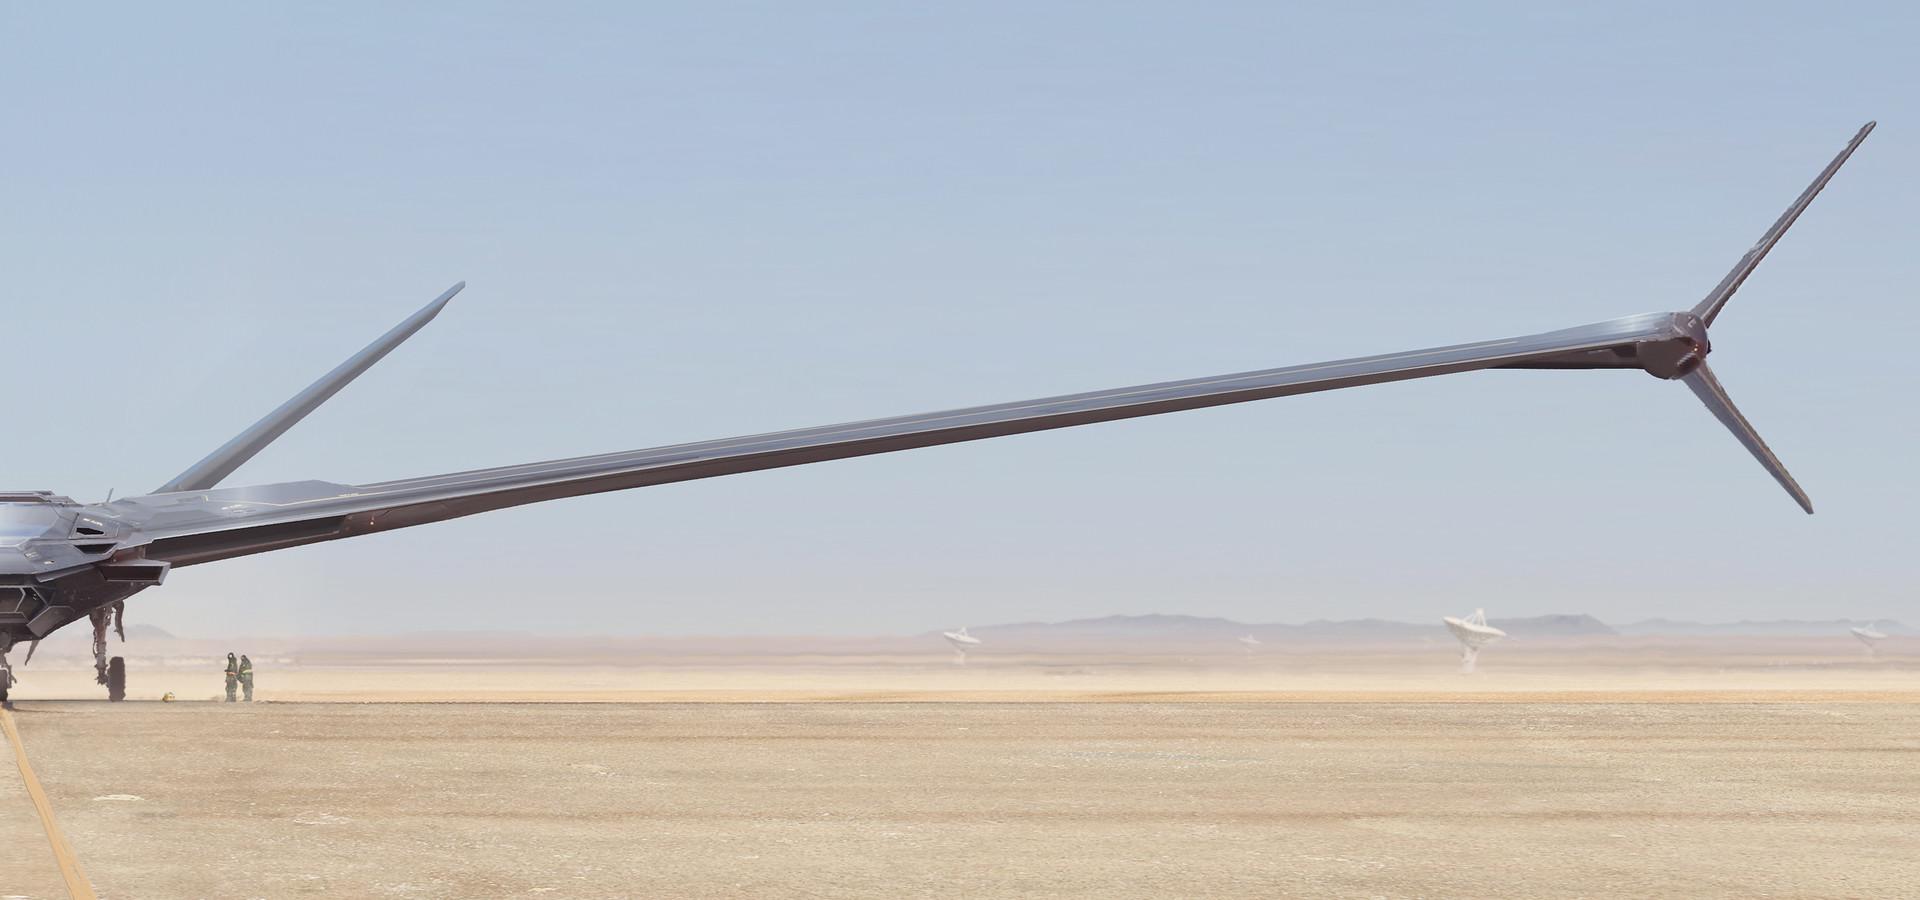 daniel-matthews-light-glider-02.jpg?1487